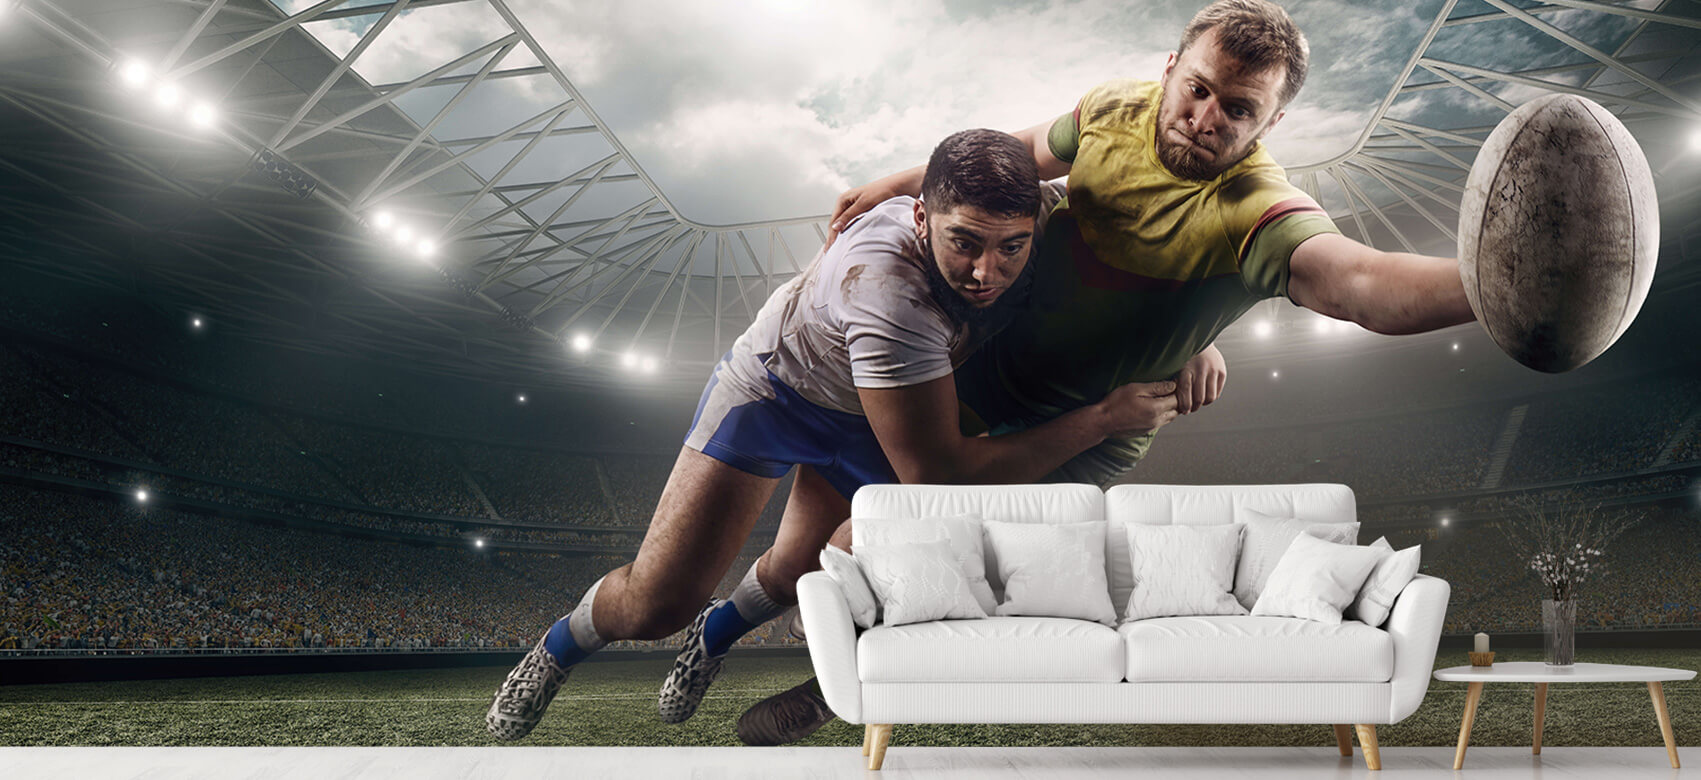 Sport Rugby spelers 6